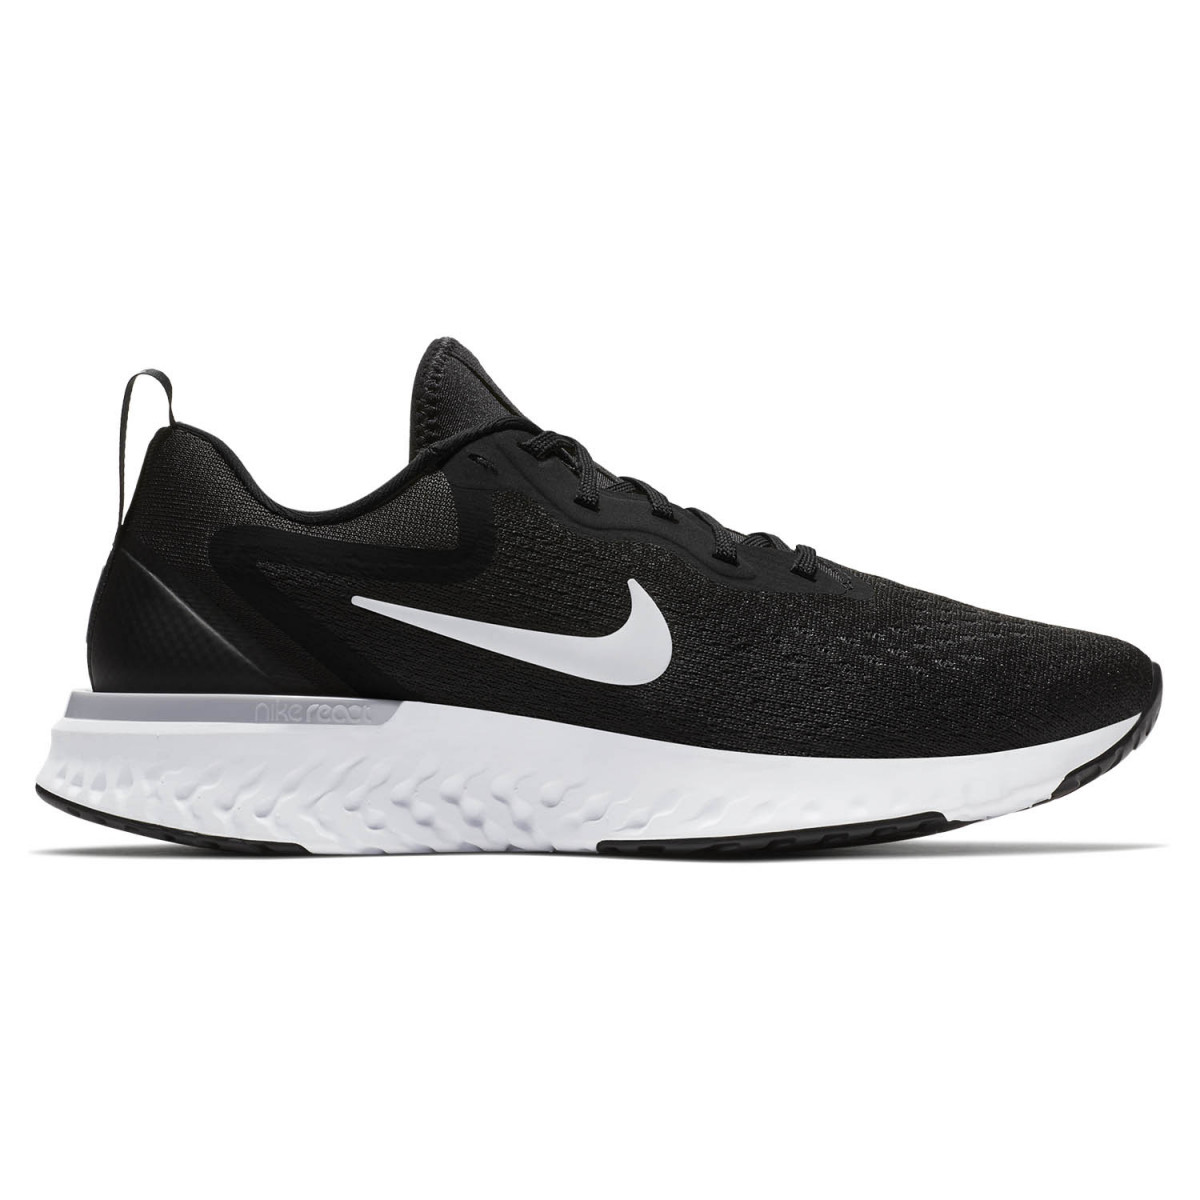 Zapatillas Nike Odyssey React - Zapatillas - Alerta de Precios 9cb4546da67f5